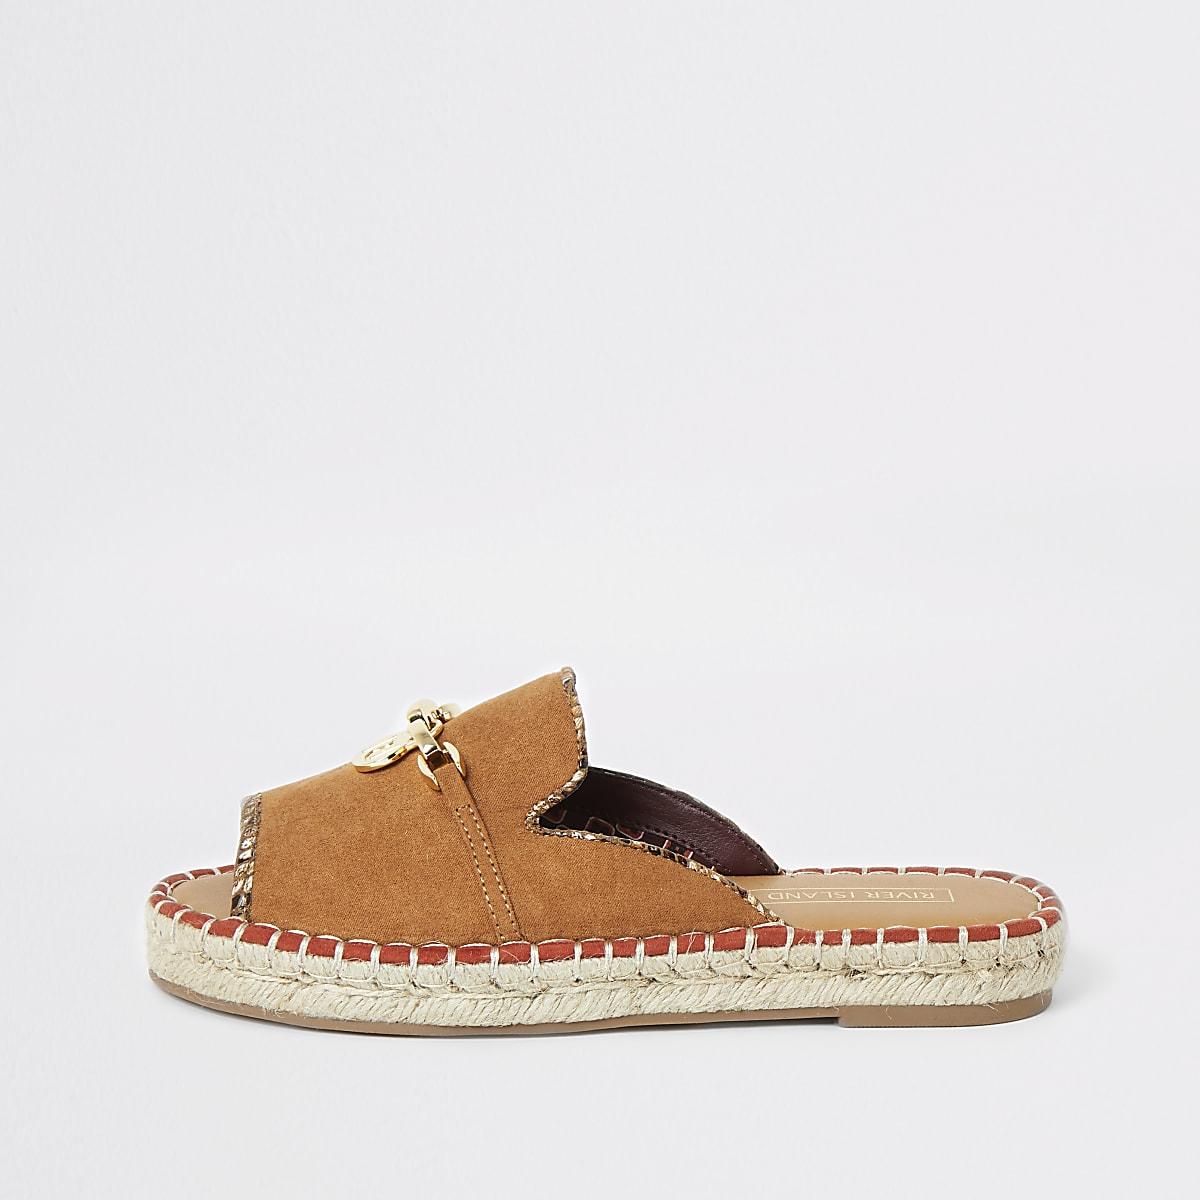 Brown espadrille peep toe sandals